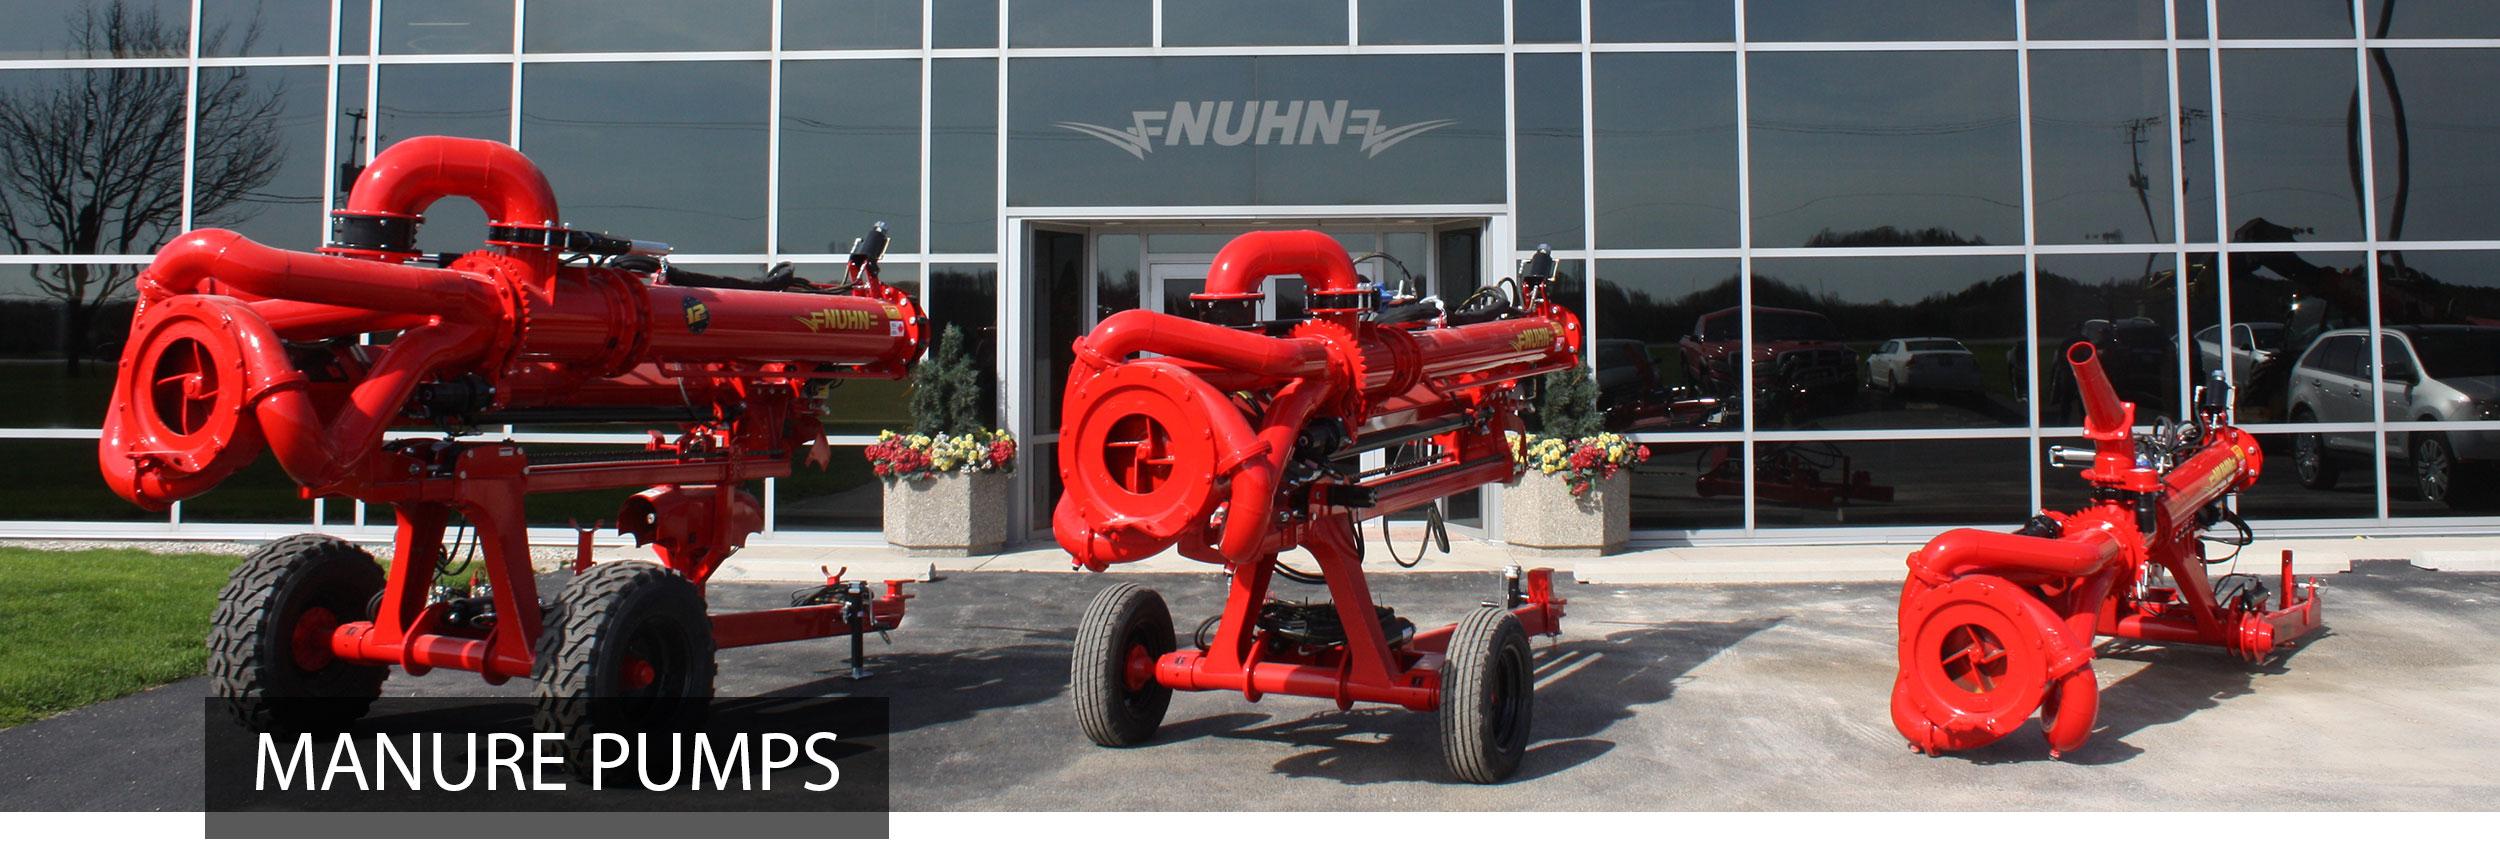 Manure Pumps